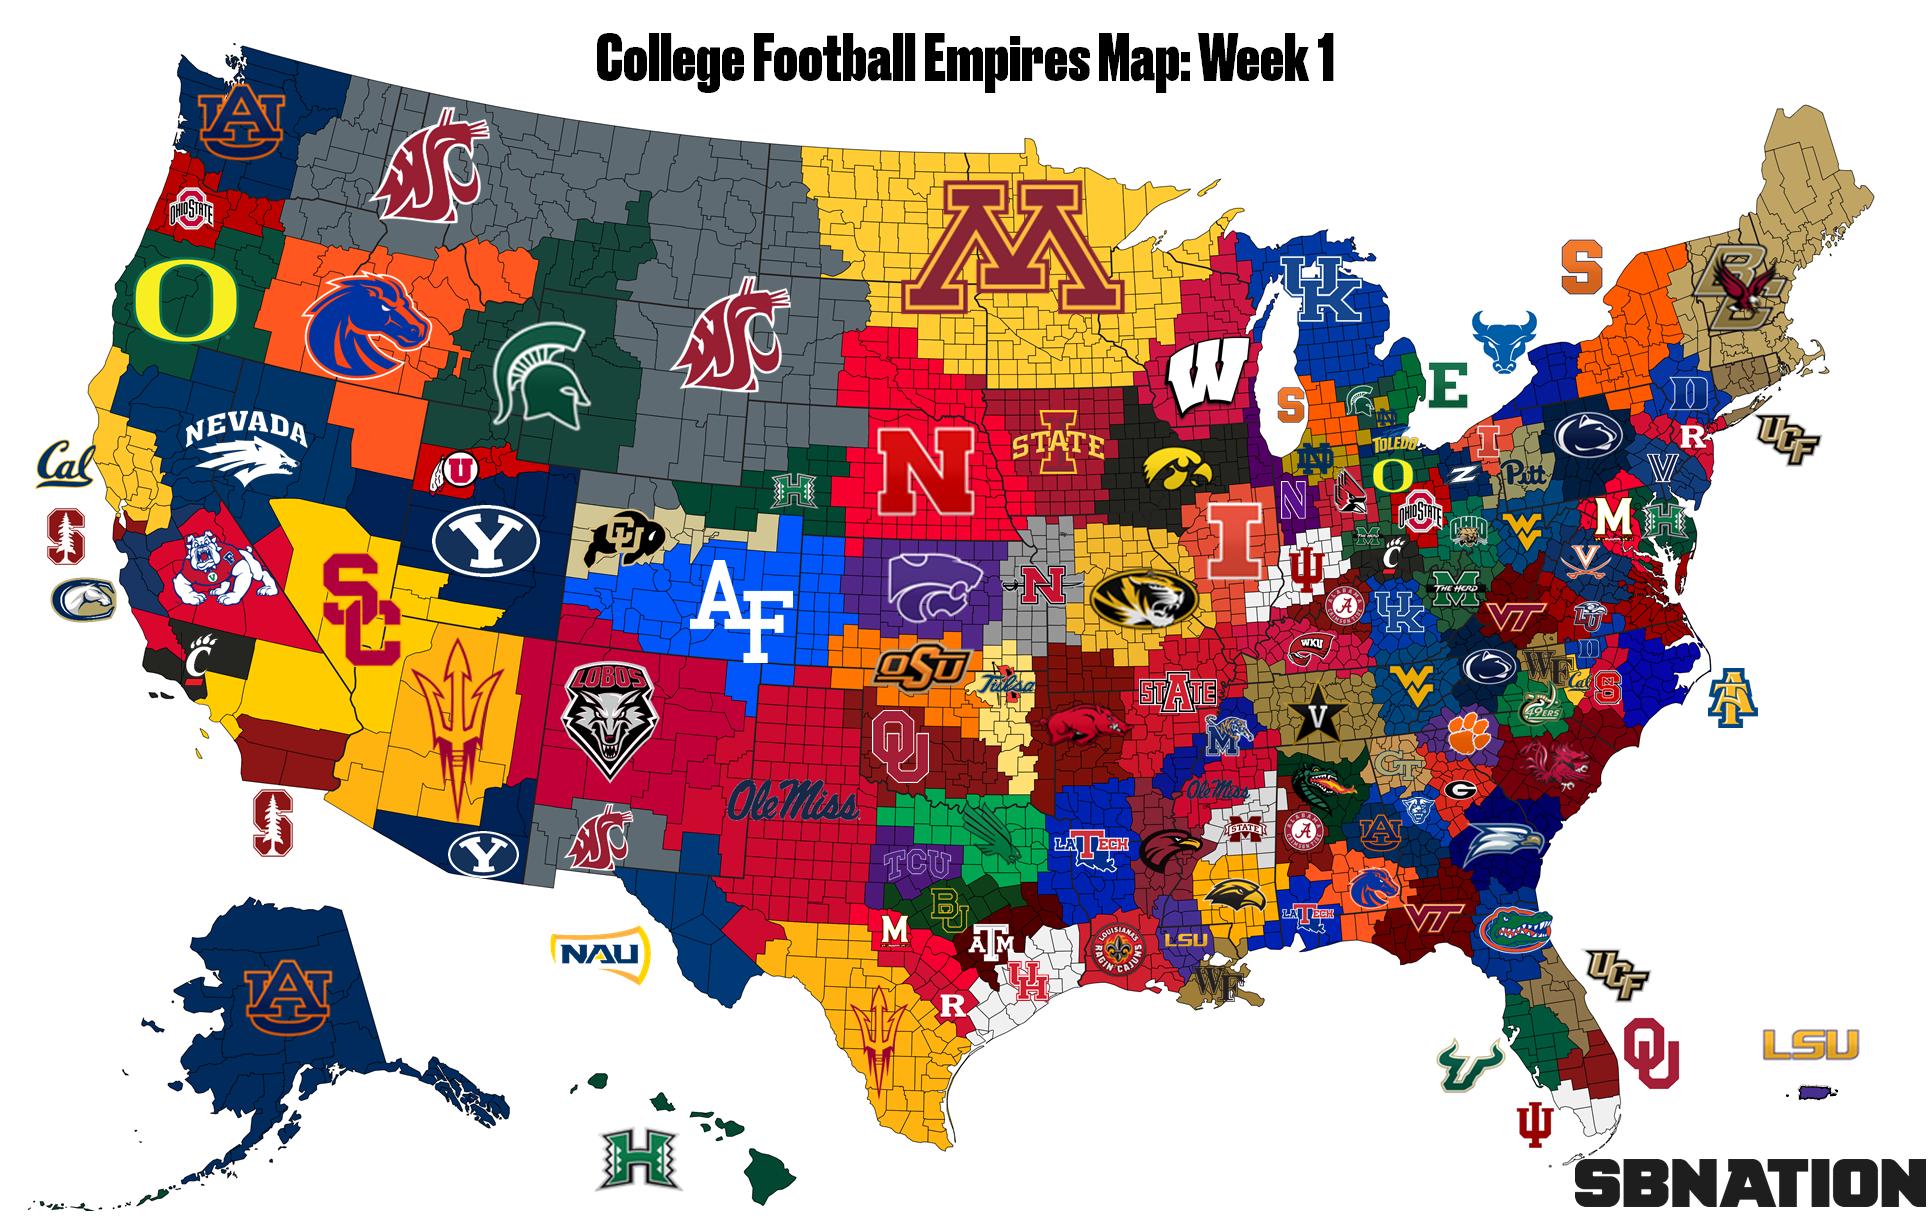 2018 College Football Empires Map, Week 1 - SBNation.com